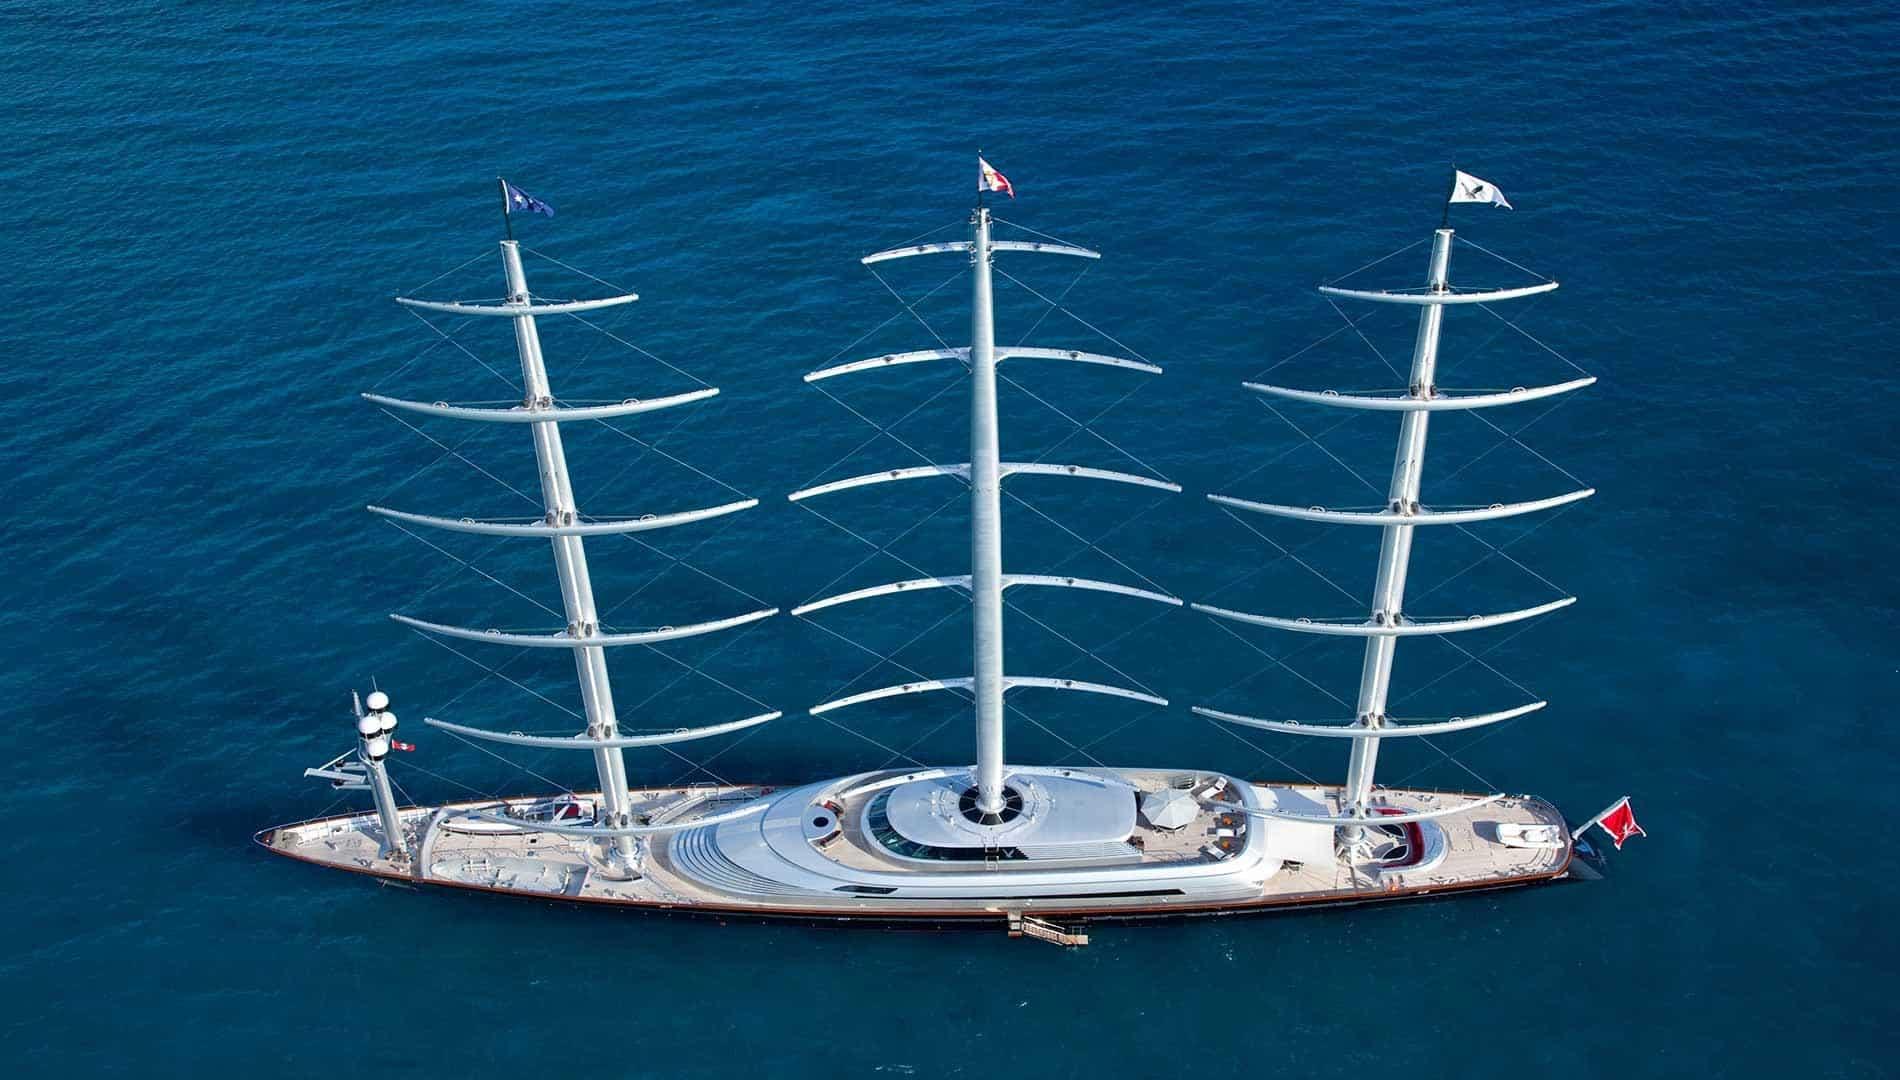 Beatuful Maltese Falcon luxury yacht sailing the high seas